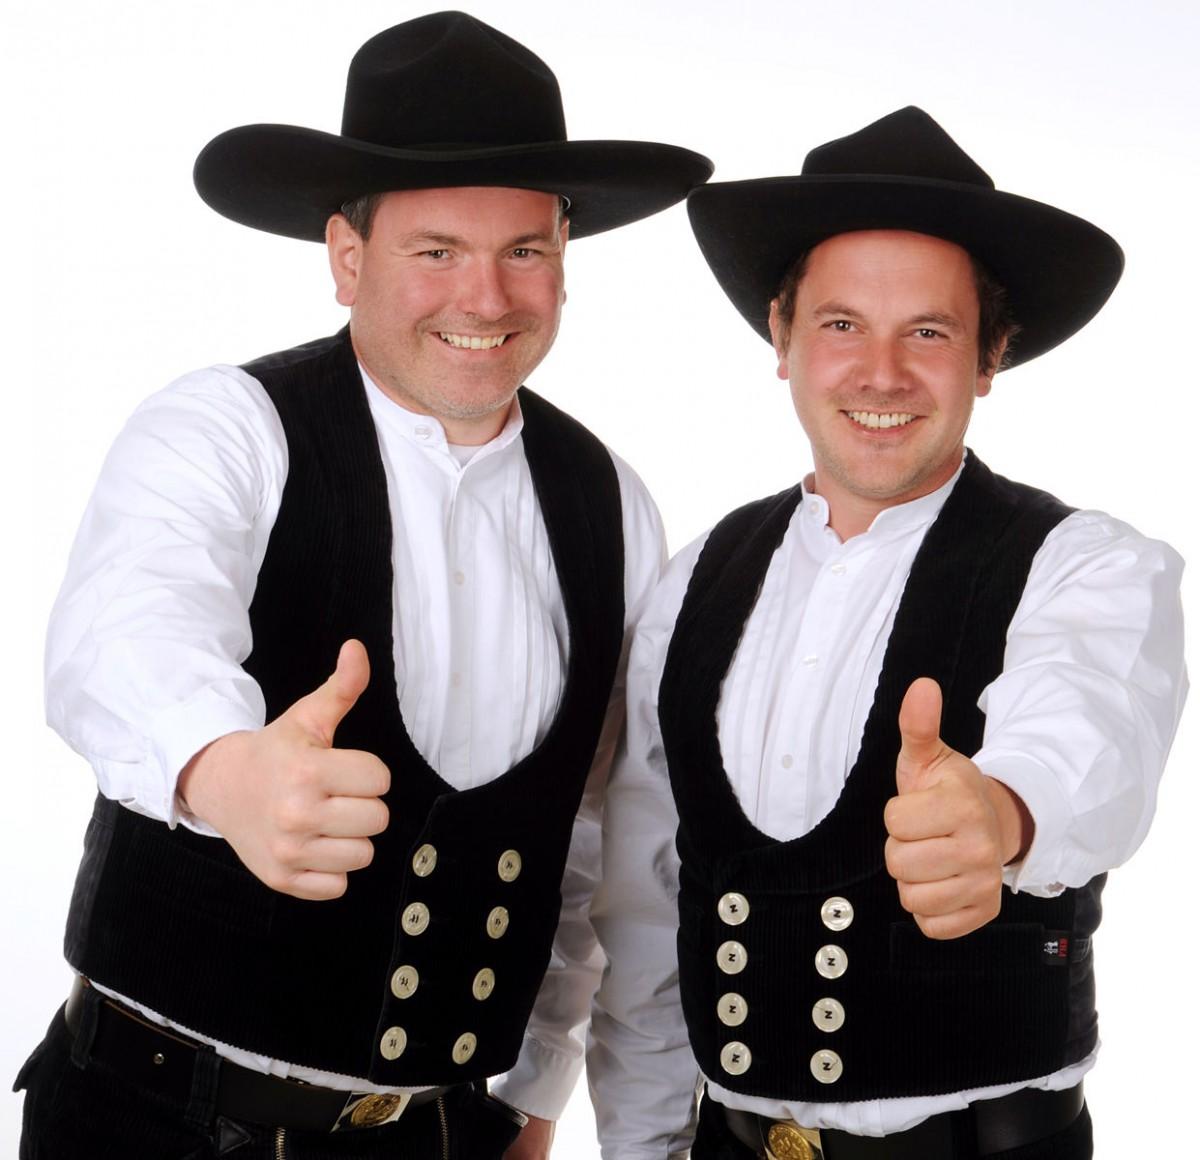 Thomas Freisinger und Michael Freisinger von Holzbau Freisinger